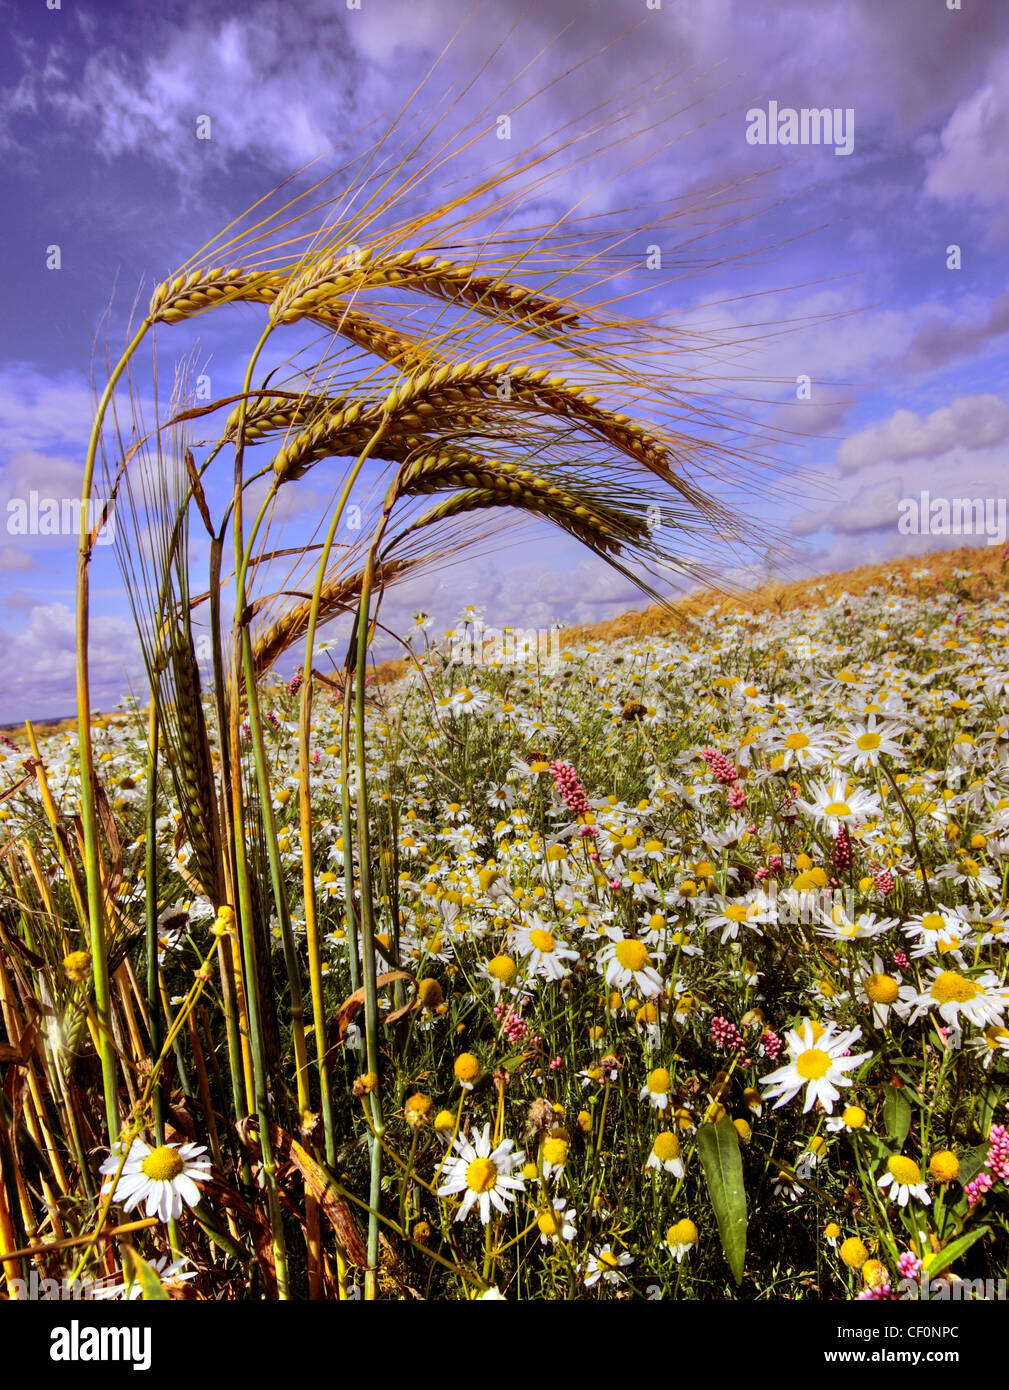 Corn in a summer English field battling wild flowers near Walton, Warrington Cheshire UK Stock Photo